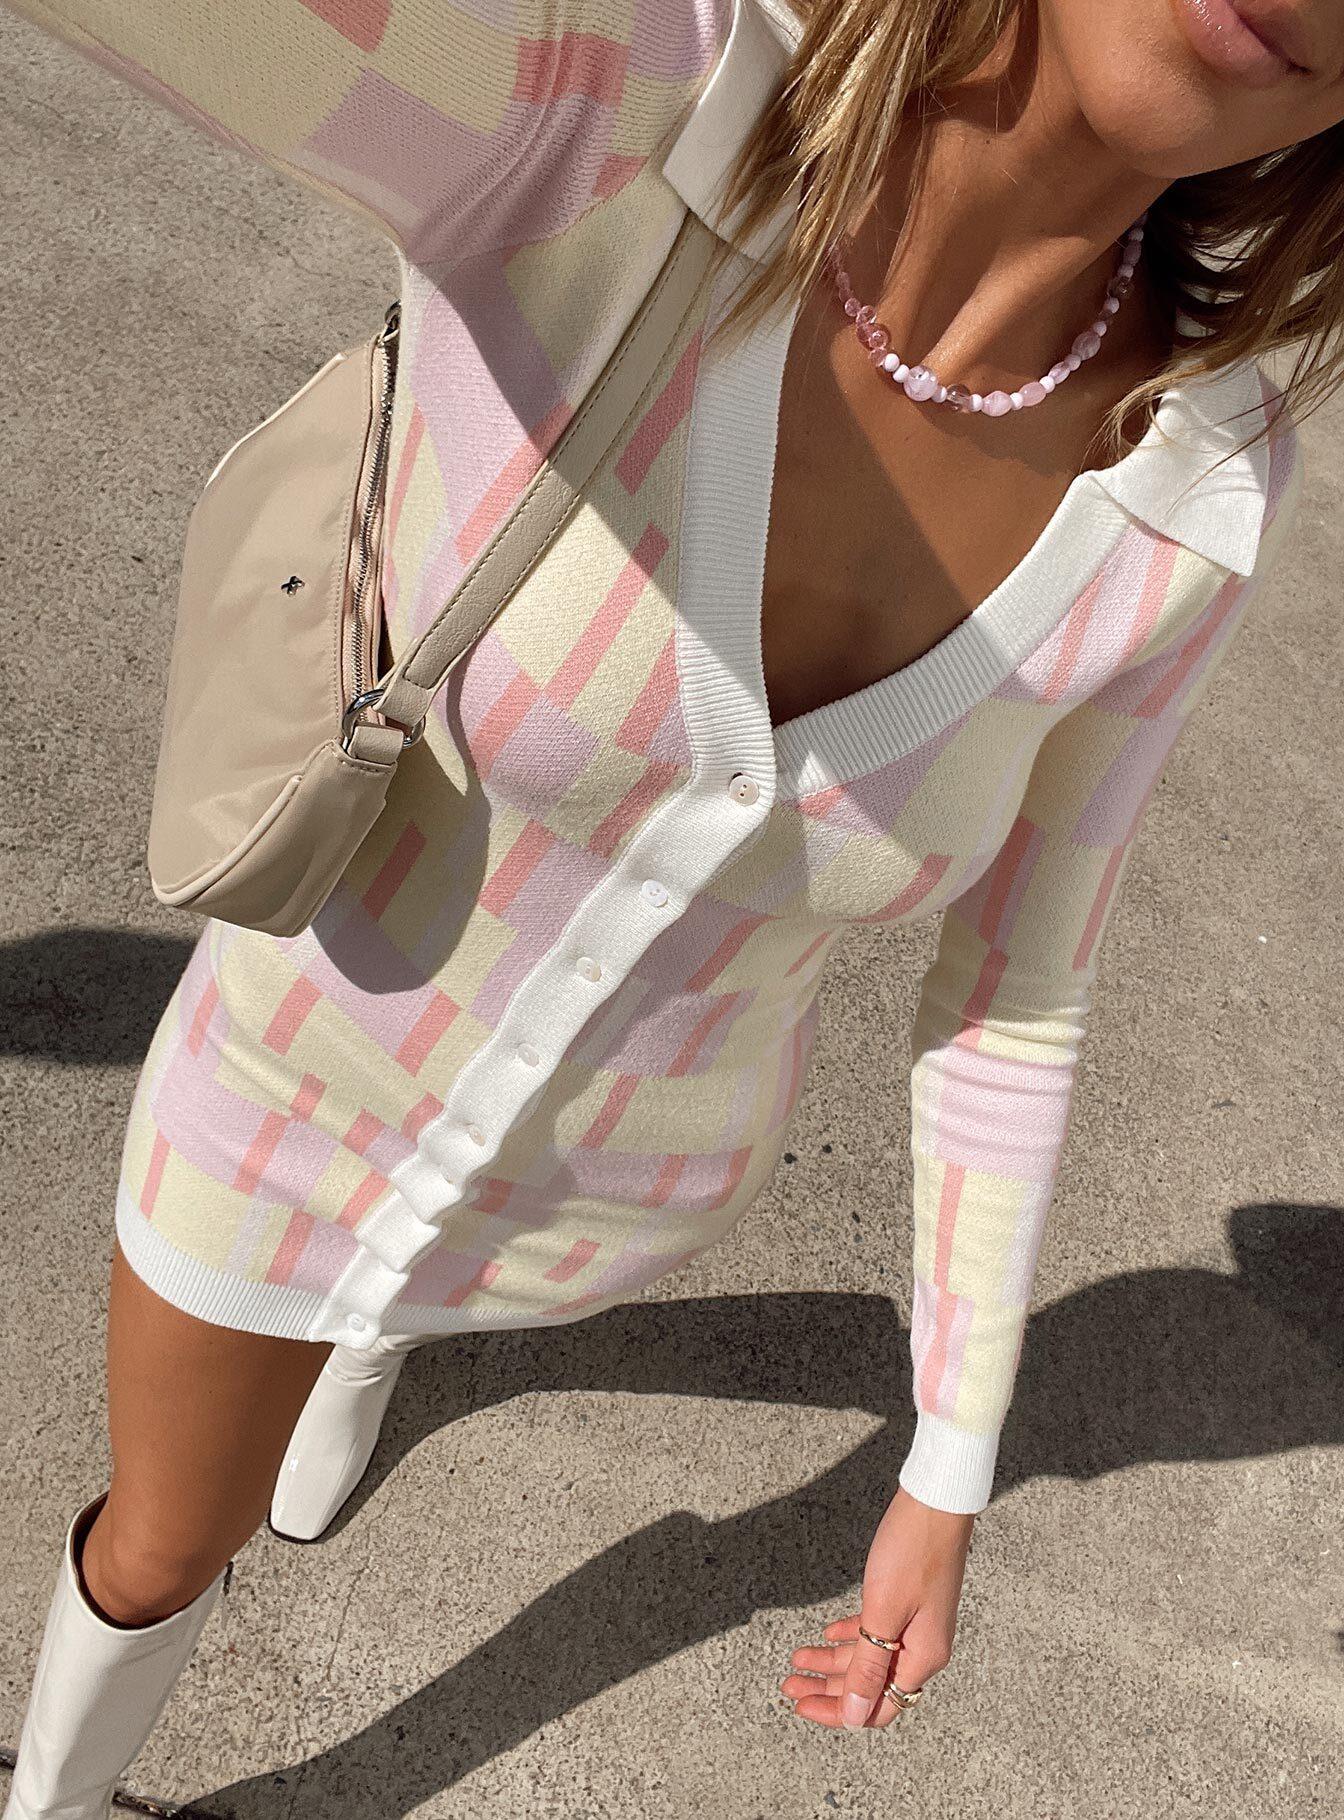 Dresses (Side A)